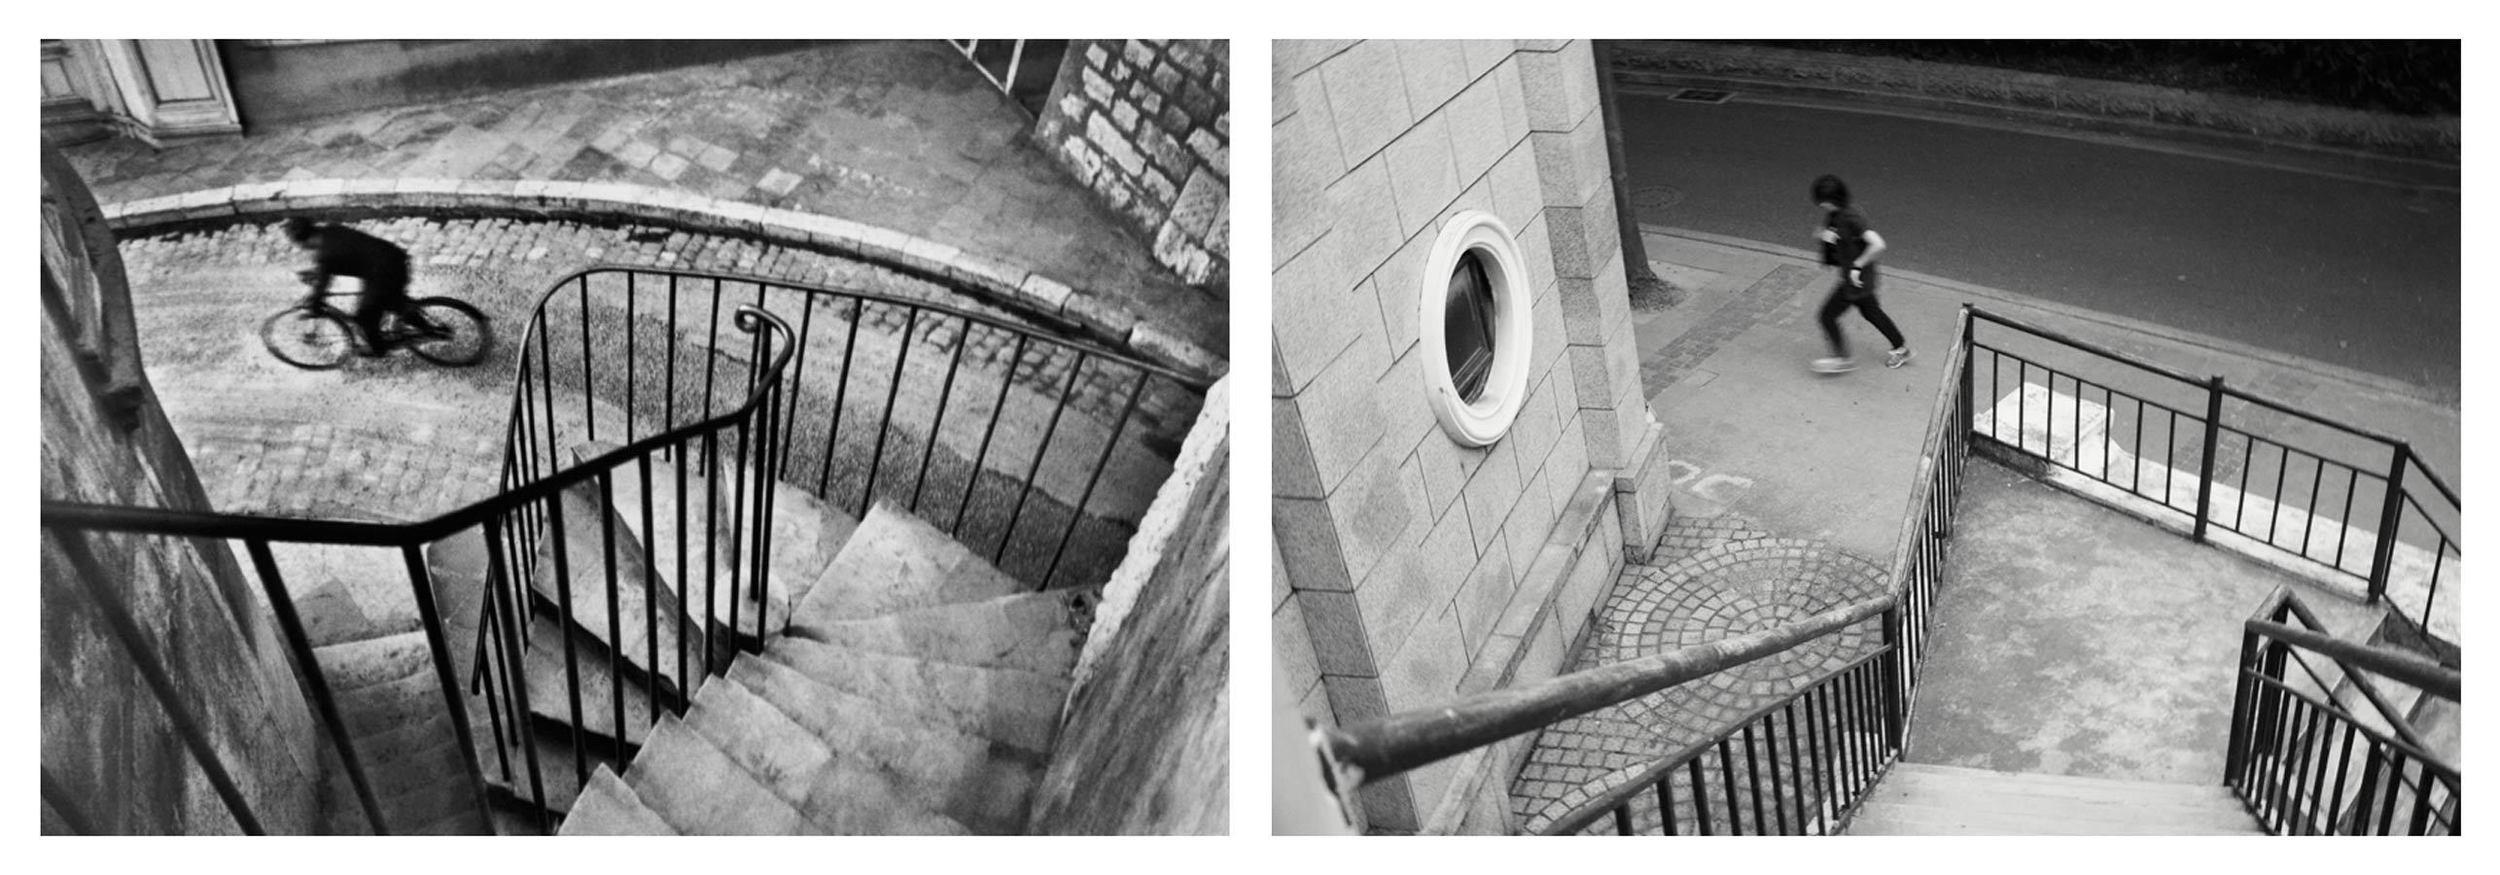 Cartier-Bresson-Homage_2.jpg